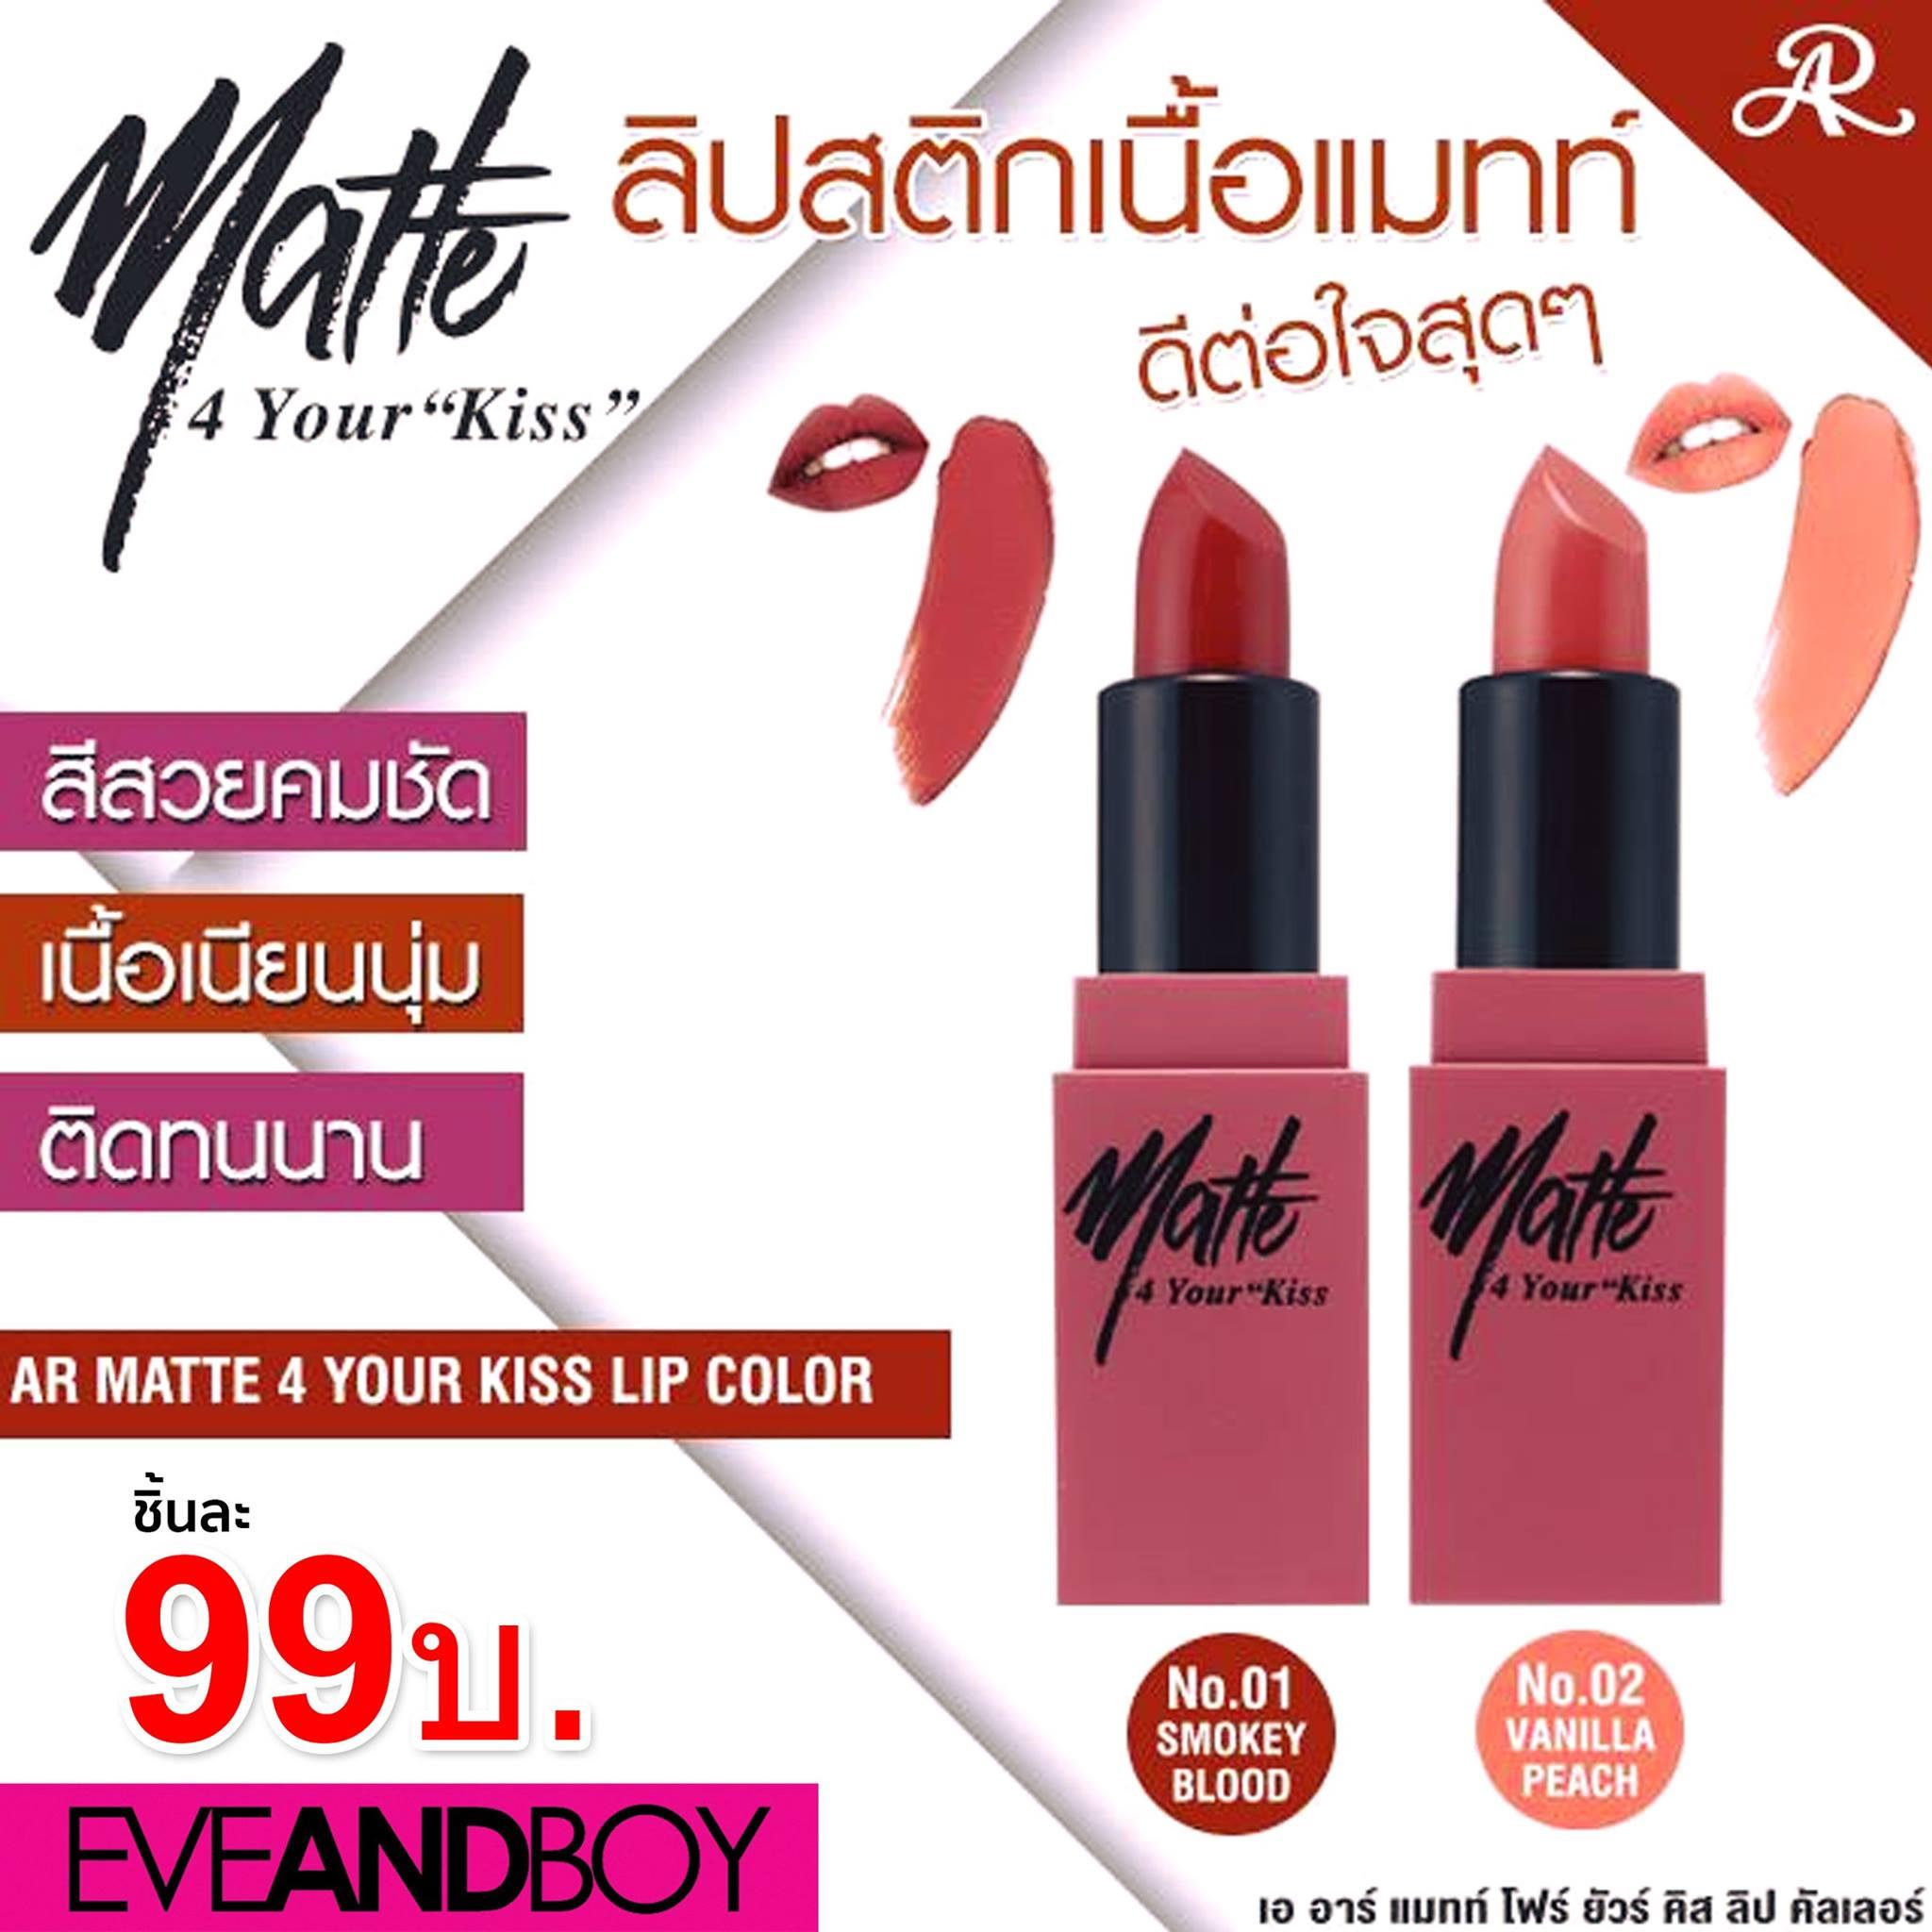 [Aron - Thái Lan] Son kem dạng lì Aron Super Matte 4 Your Kiss